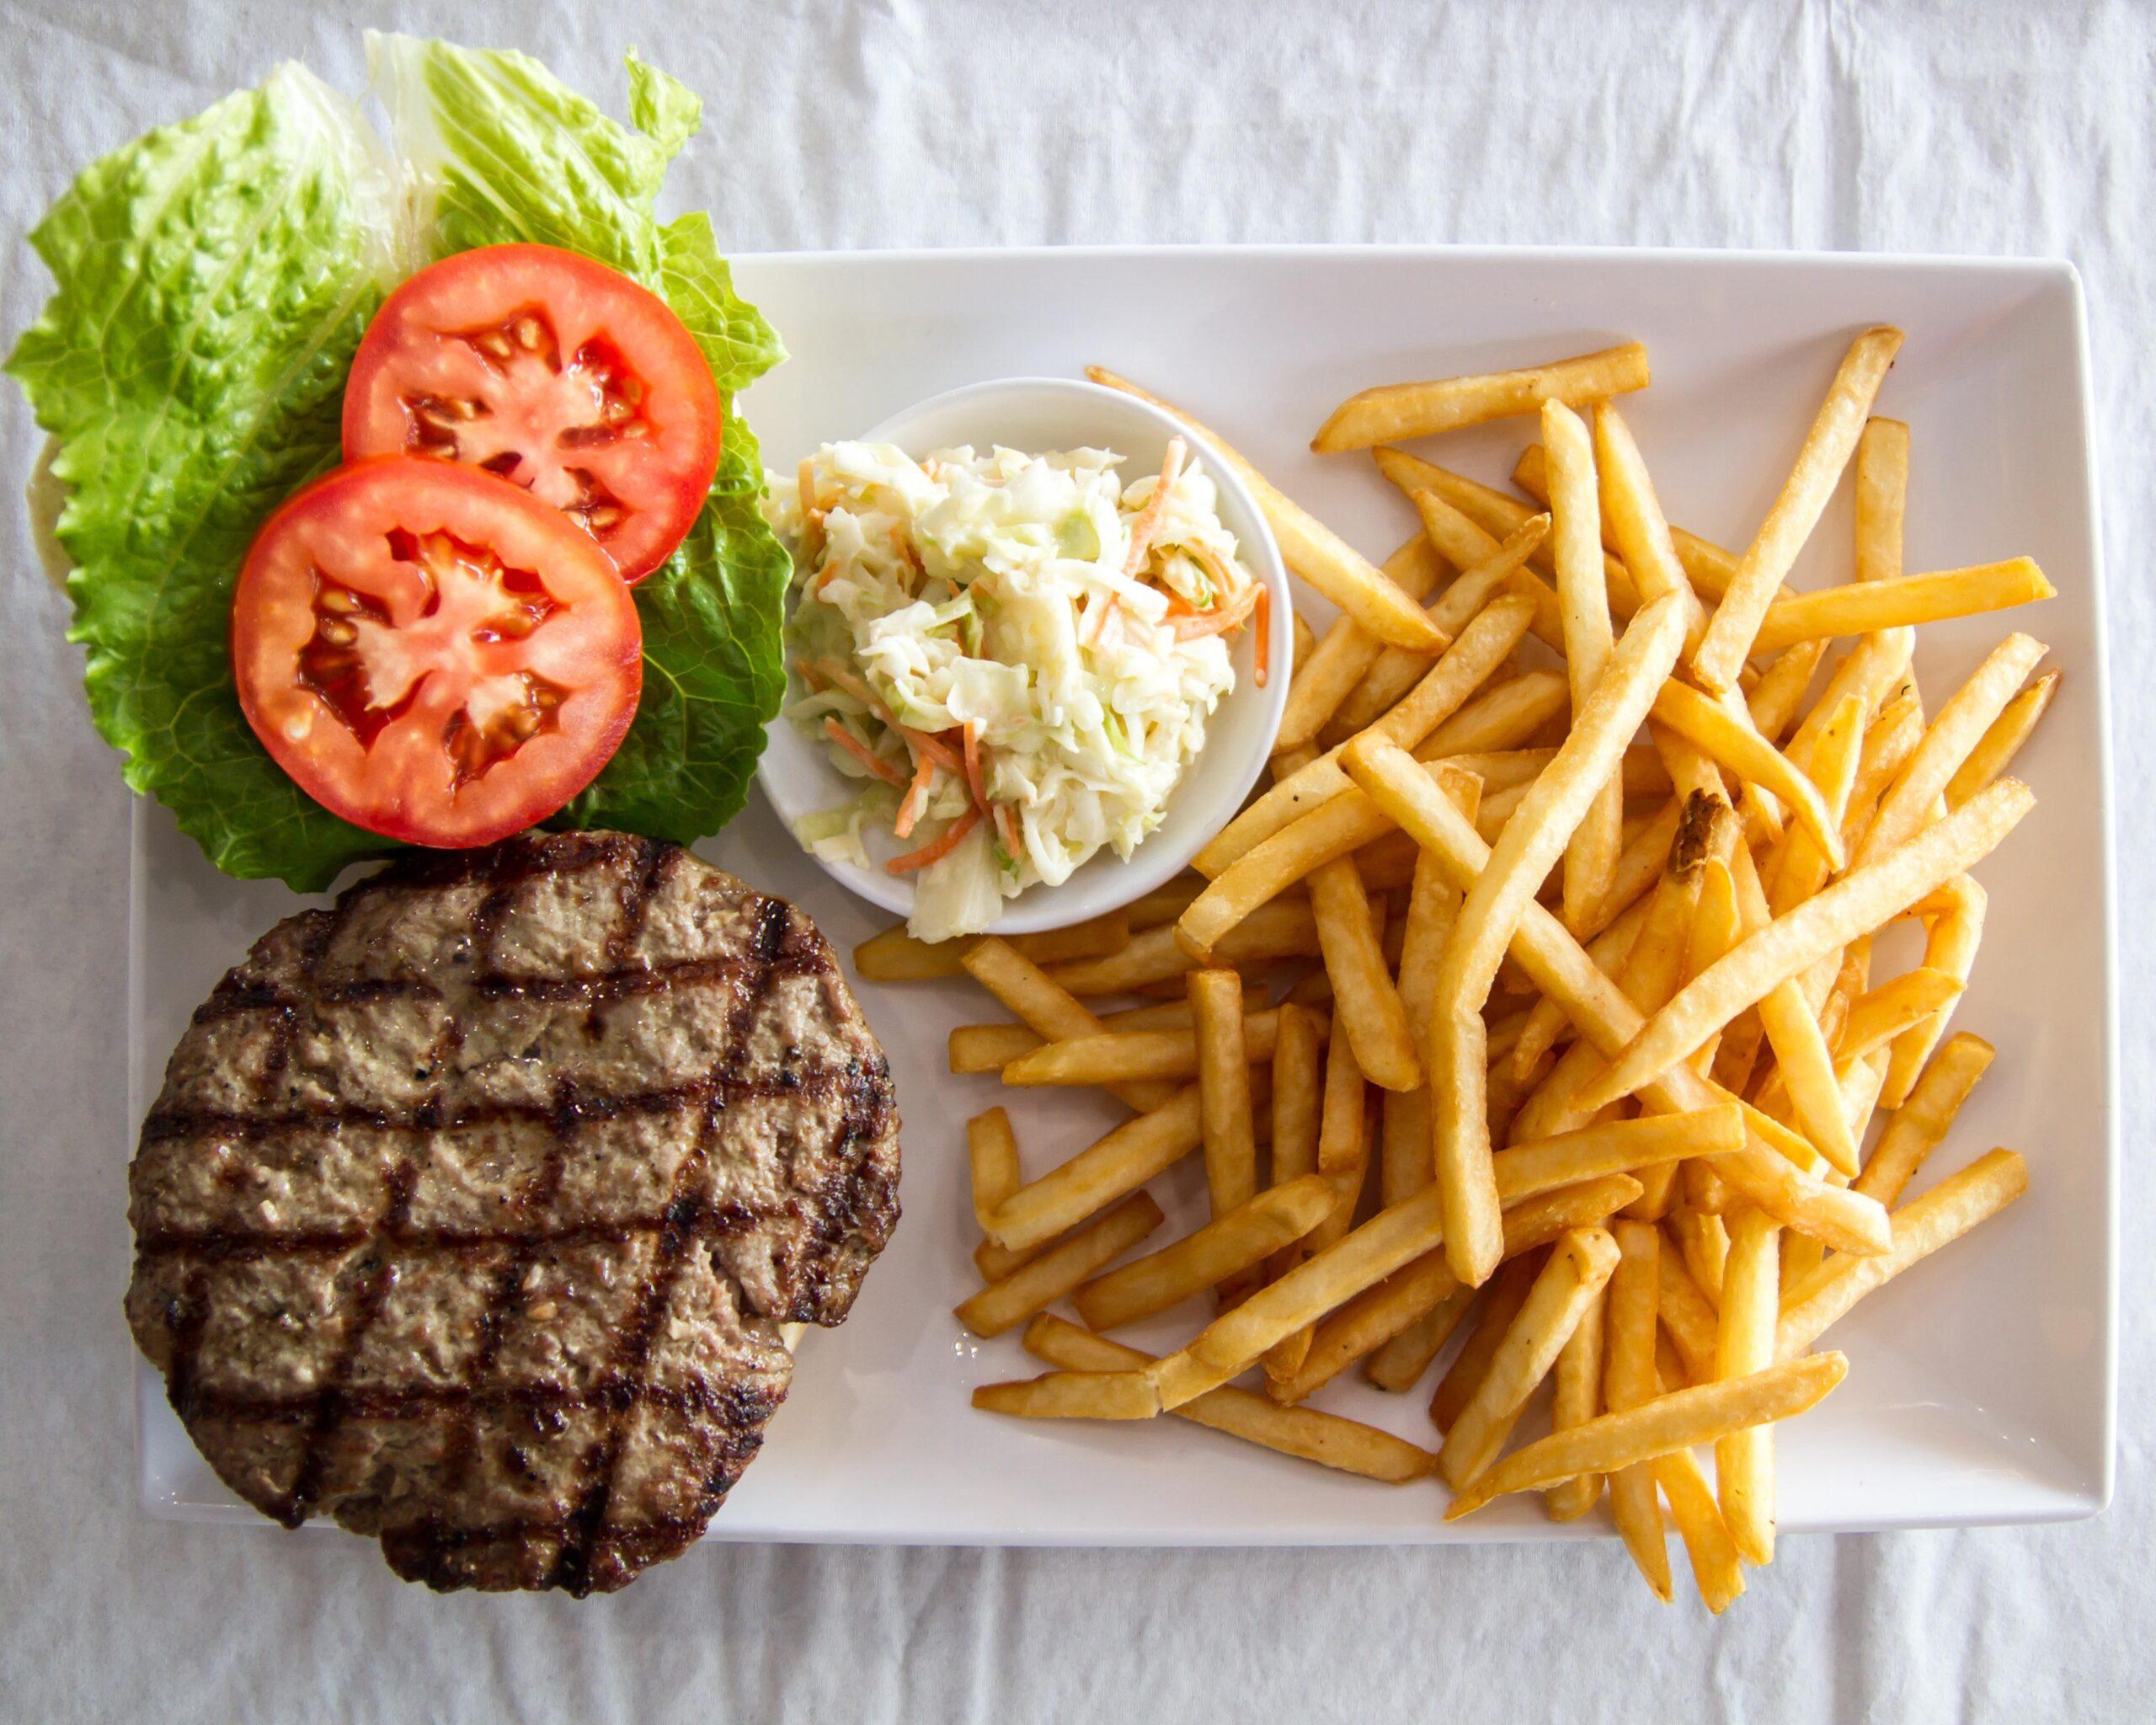 Meat-Restaurant-Meals-4-1